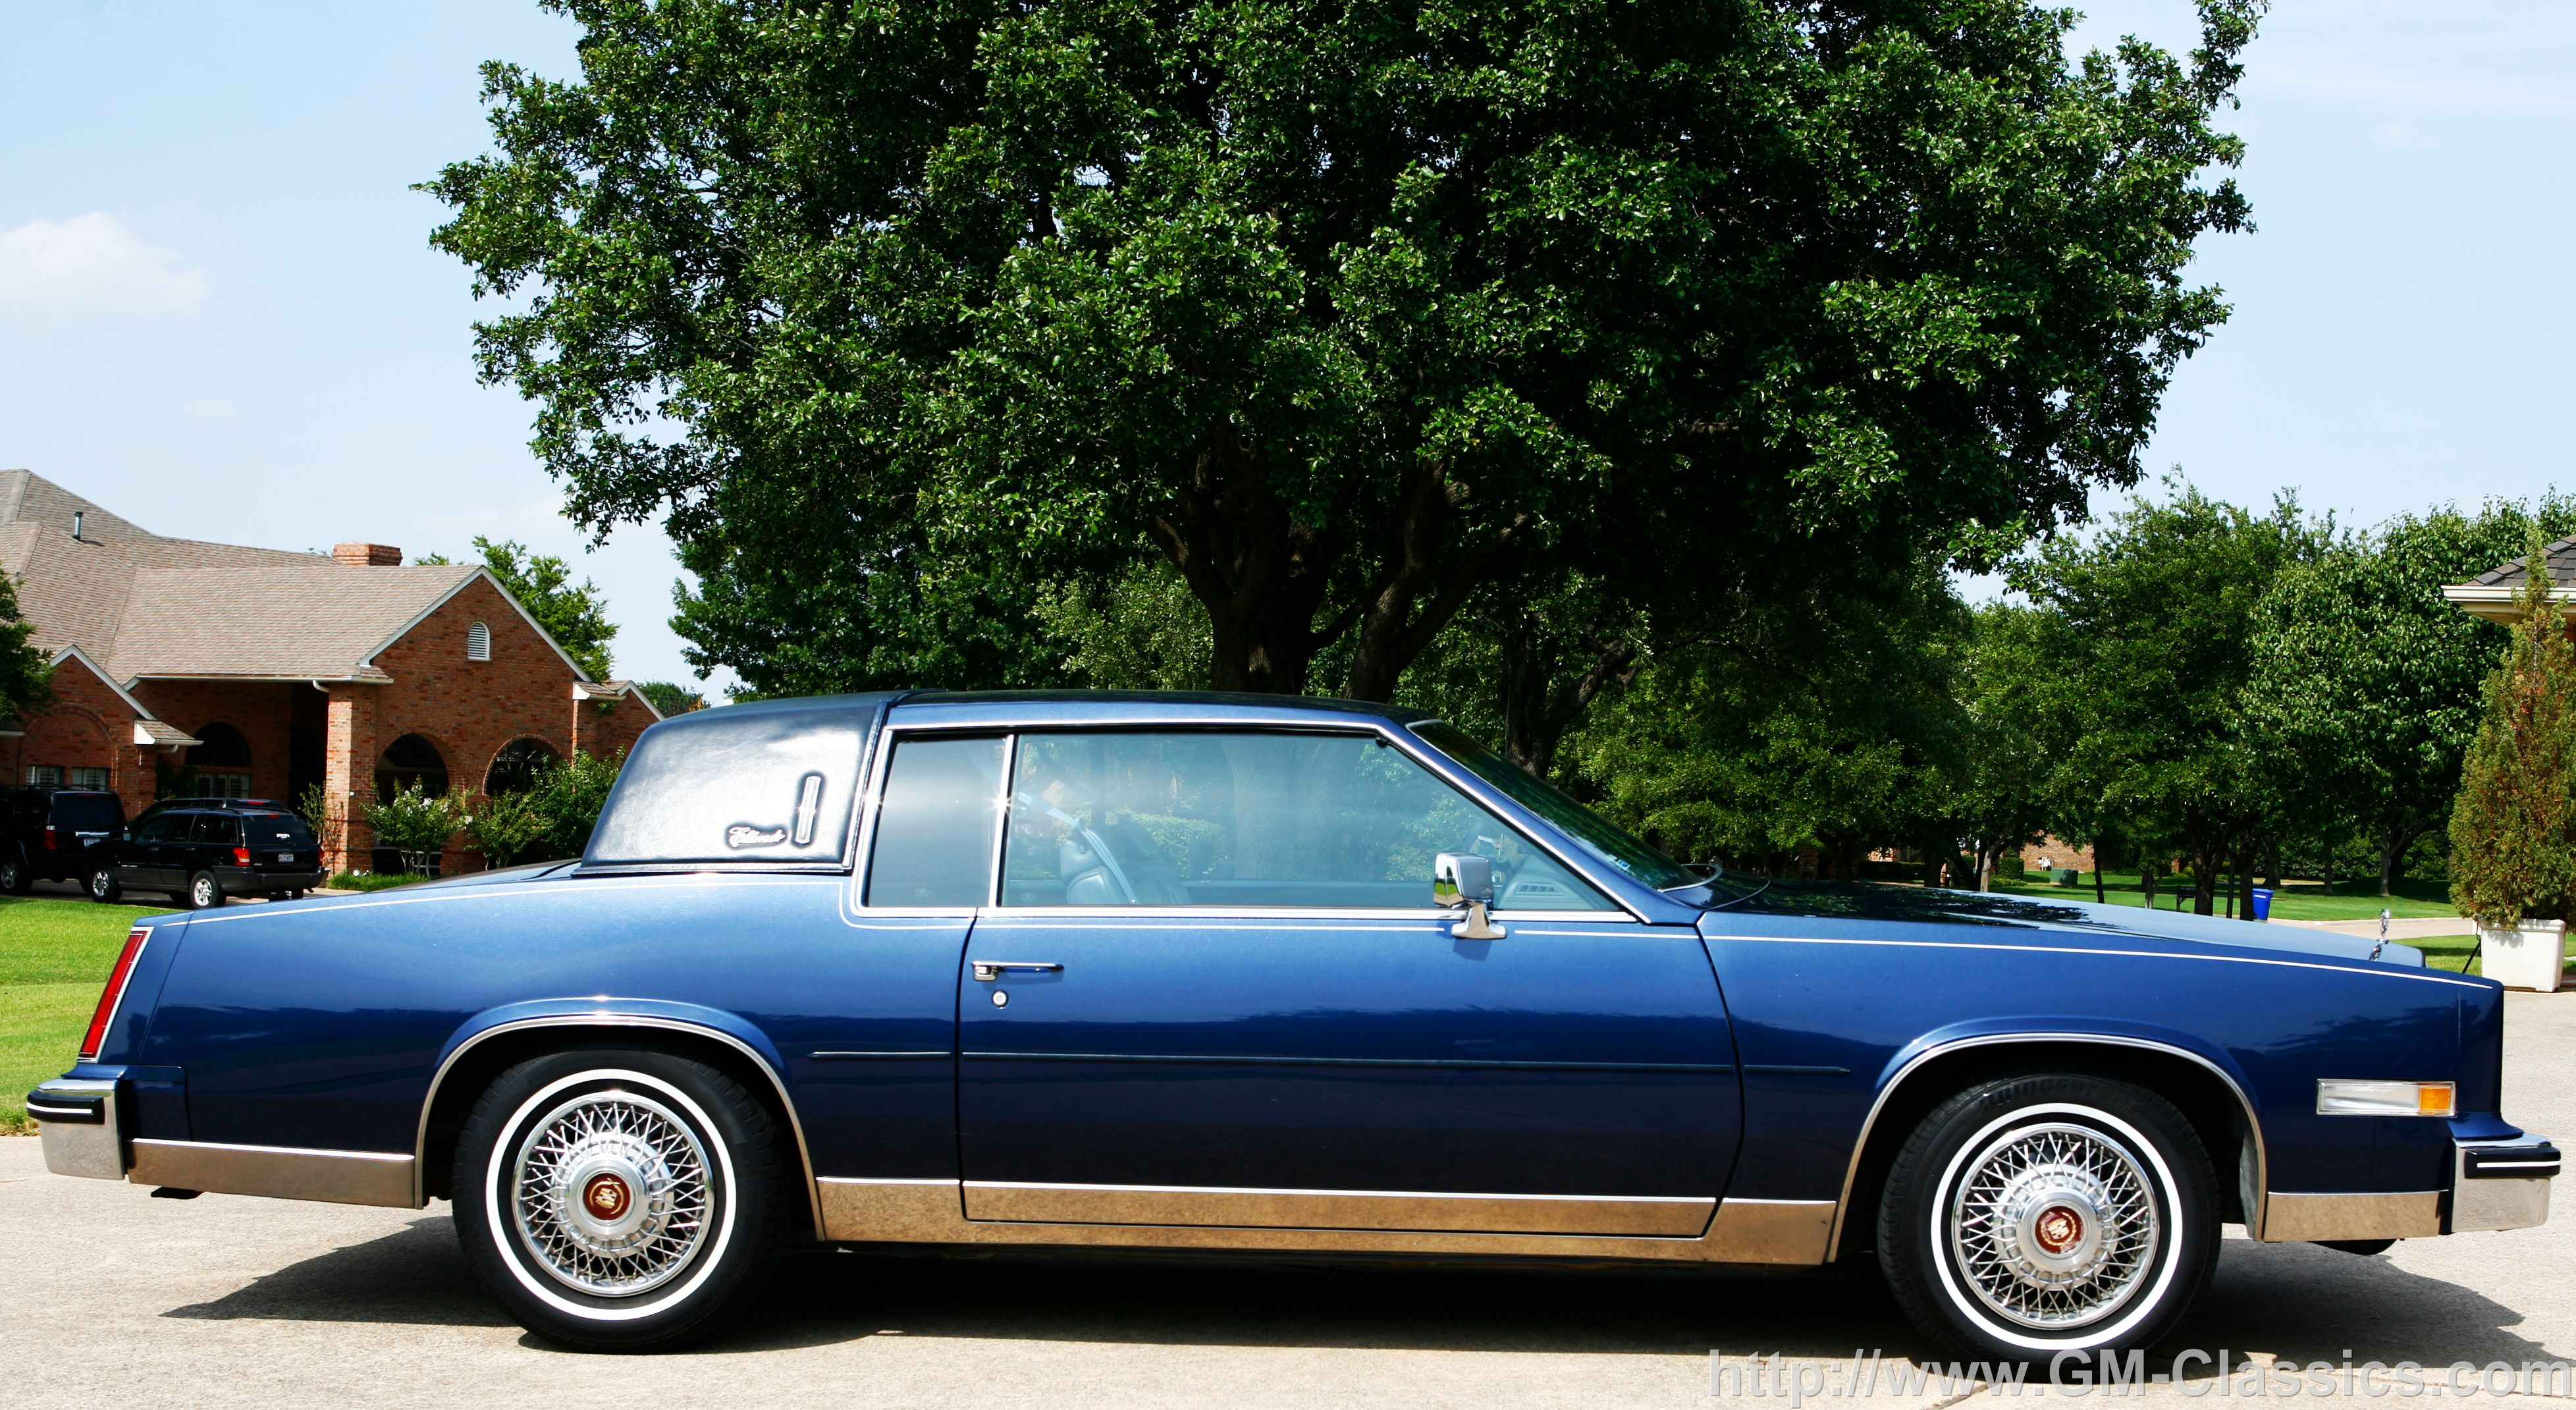 Sewell Cadillac Dallas >> 1984 Cadillac Eldorado - Matt Garrett